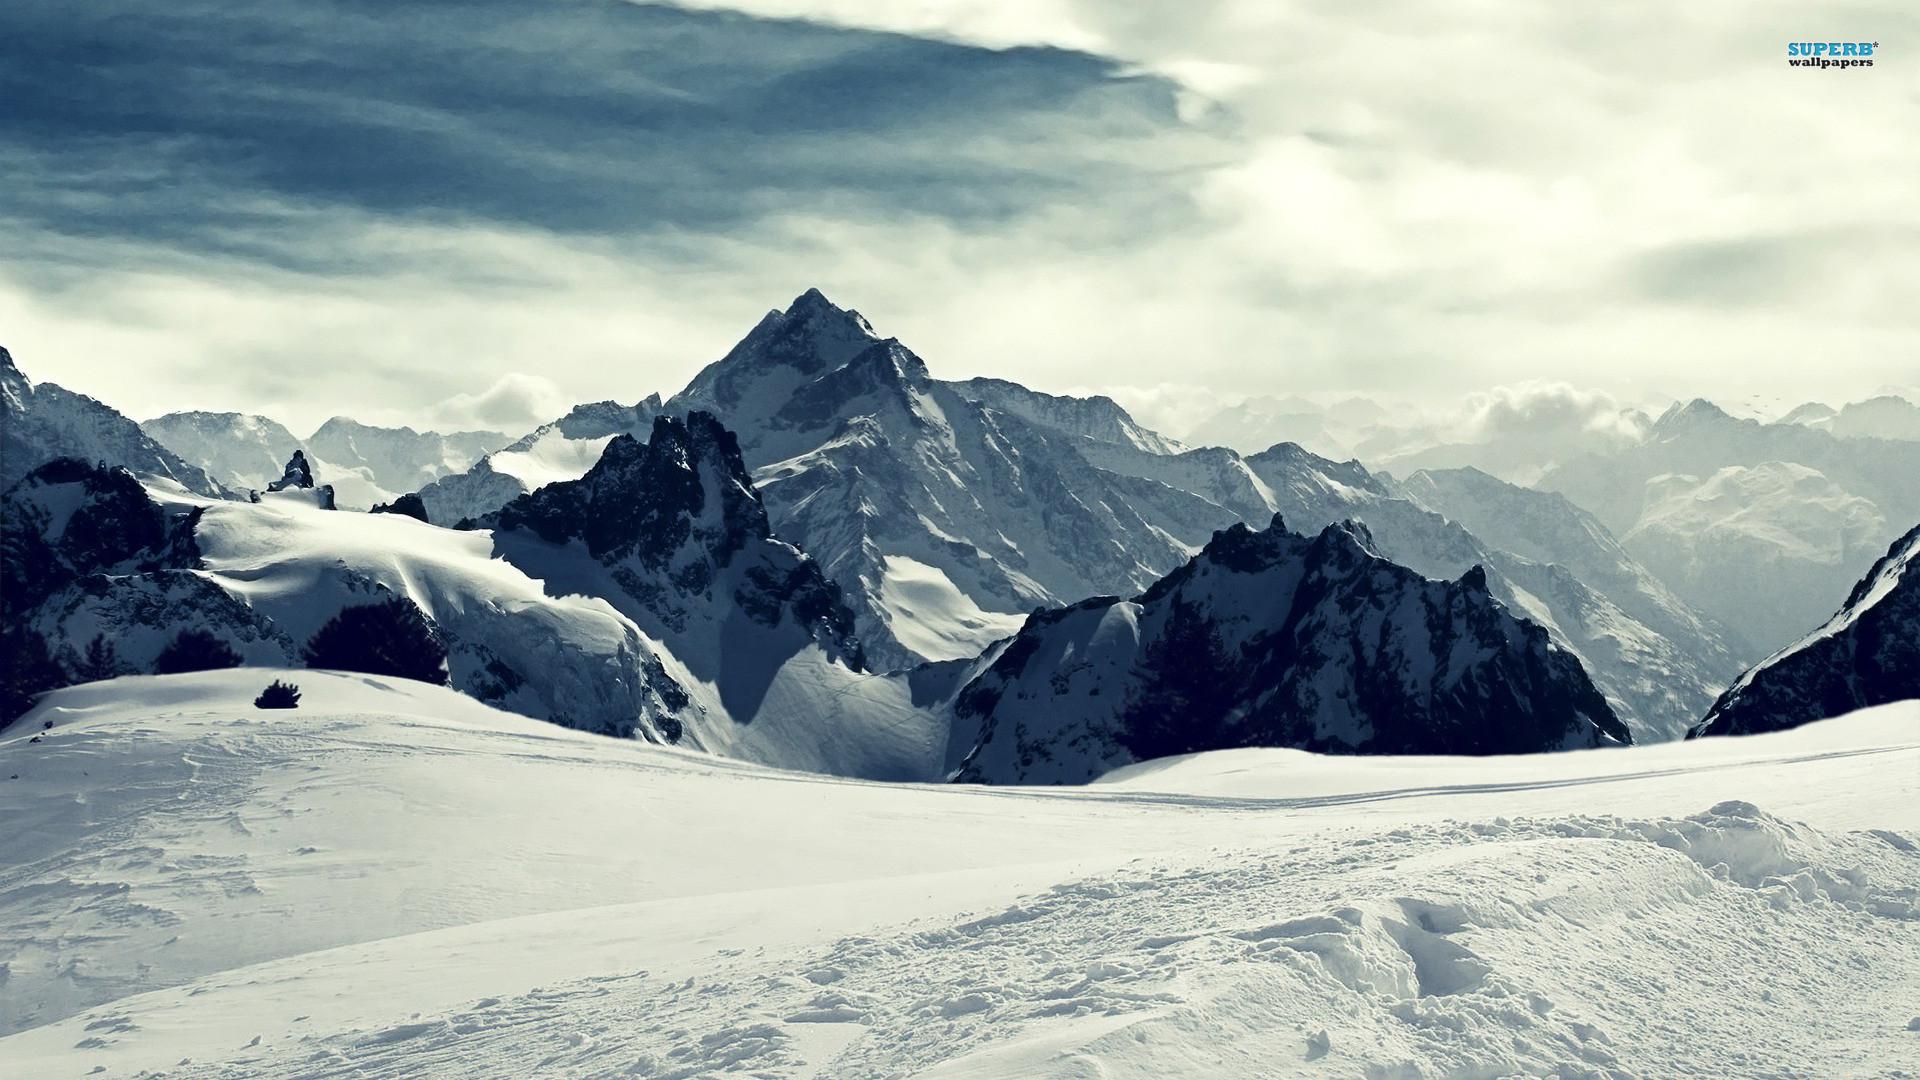 Snowy Ski Mountains. Creek in the snowy mountains wallpaper 1920×1080